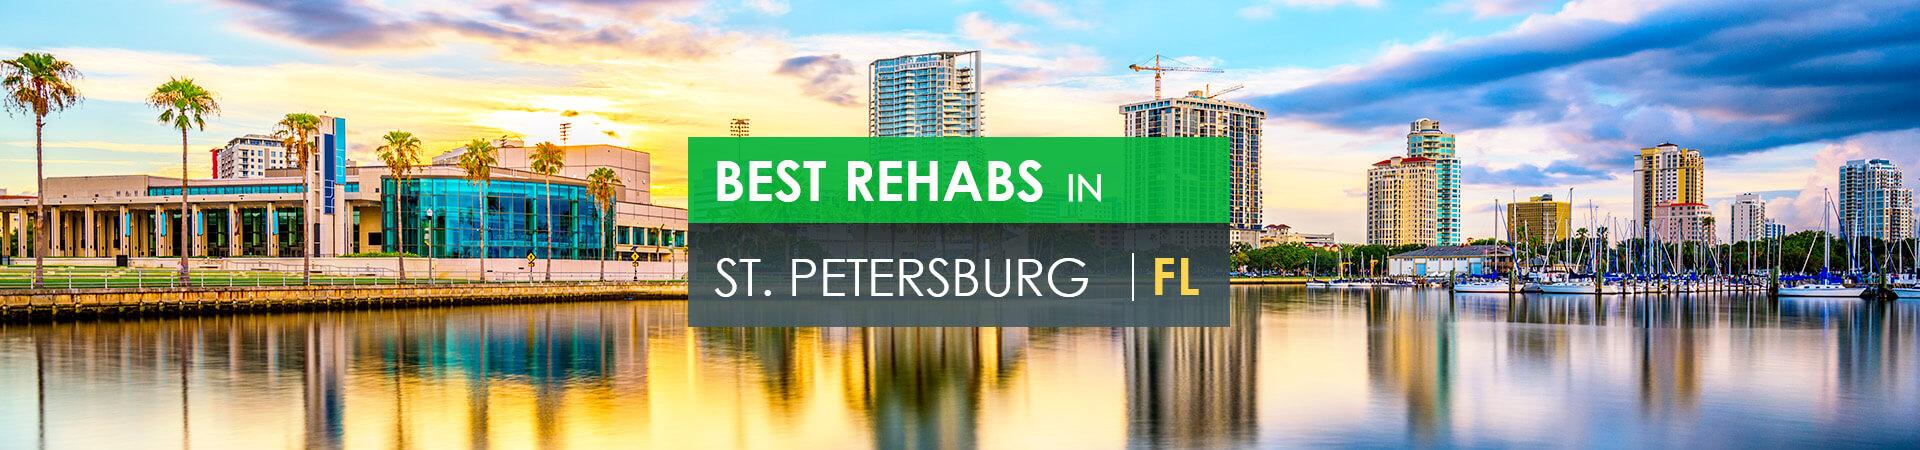 Best rehabs in St. Petersburg, FL